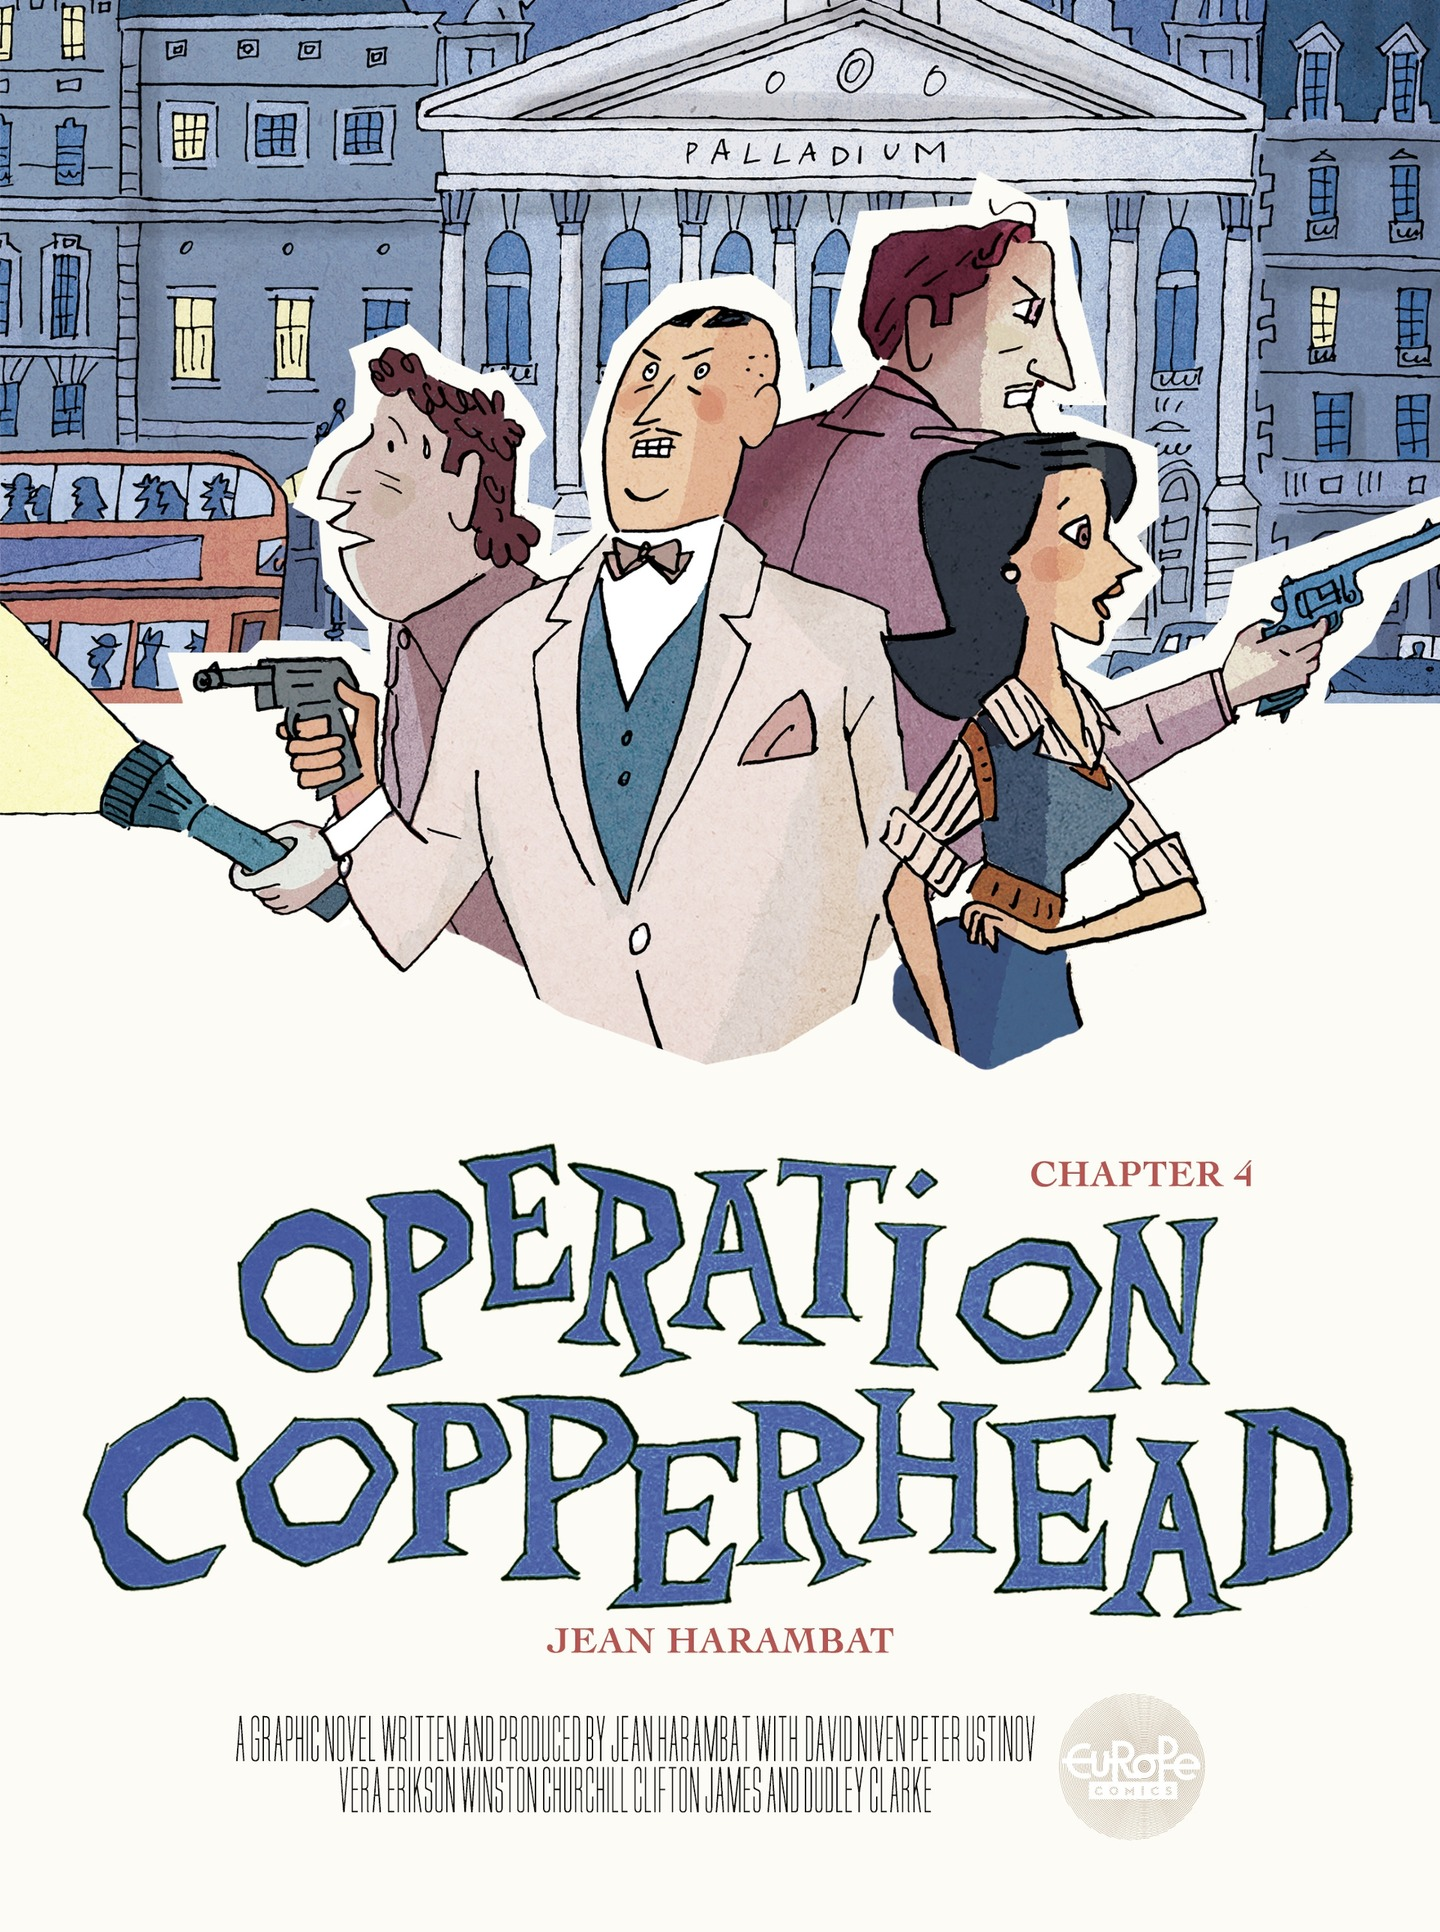 Operation Copperhead Operat...